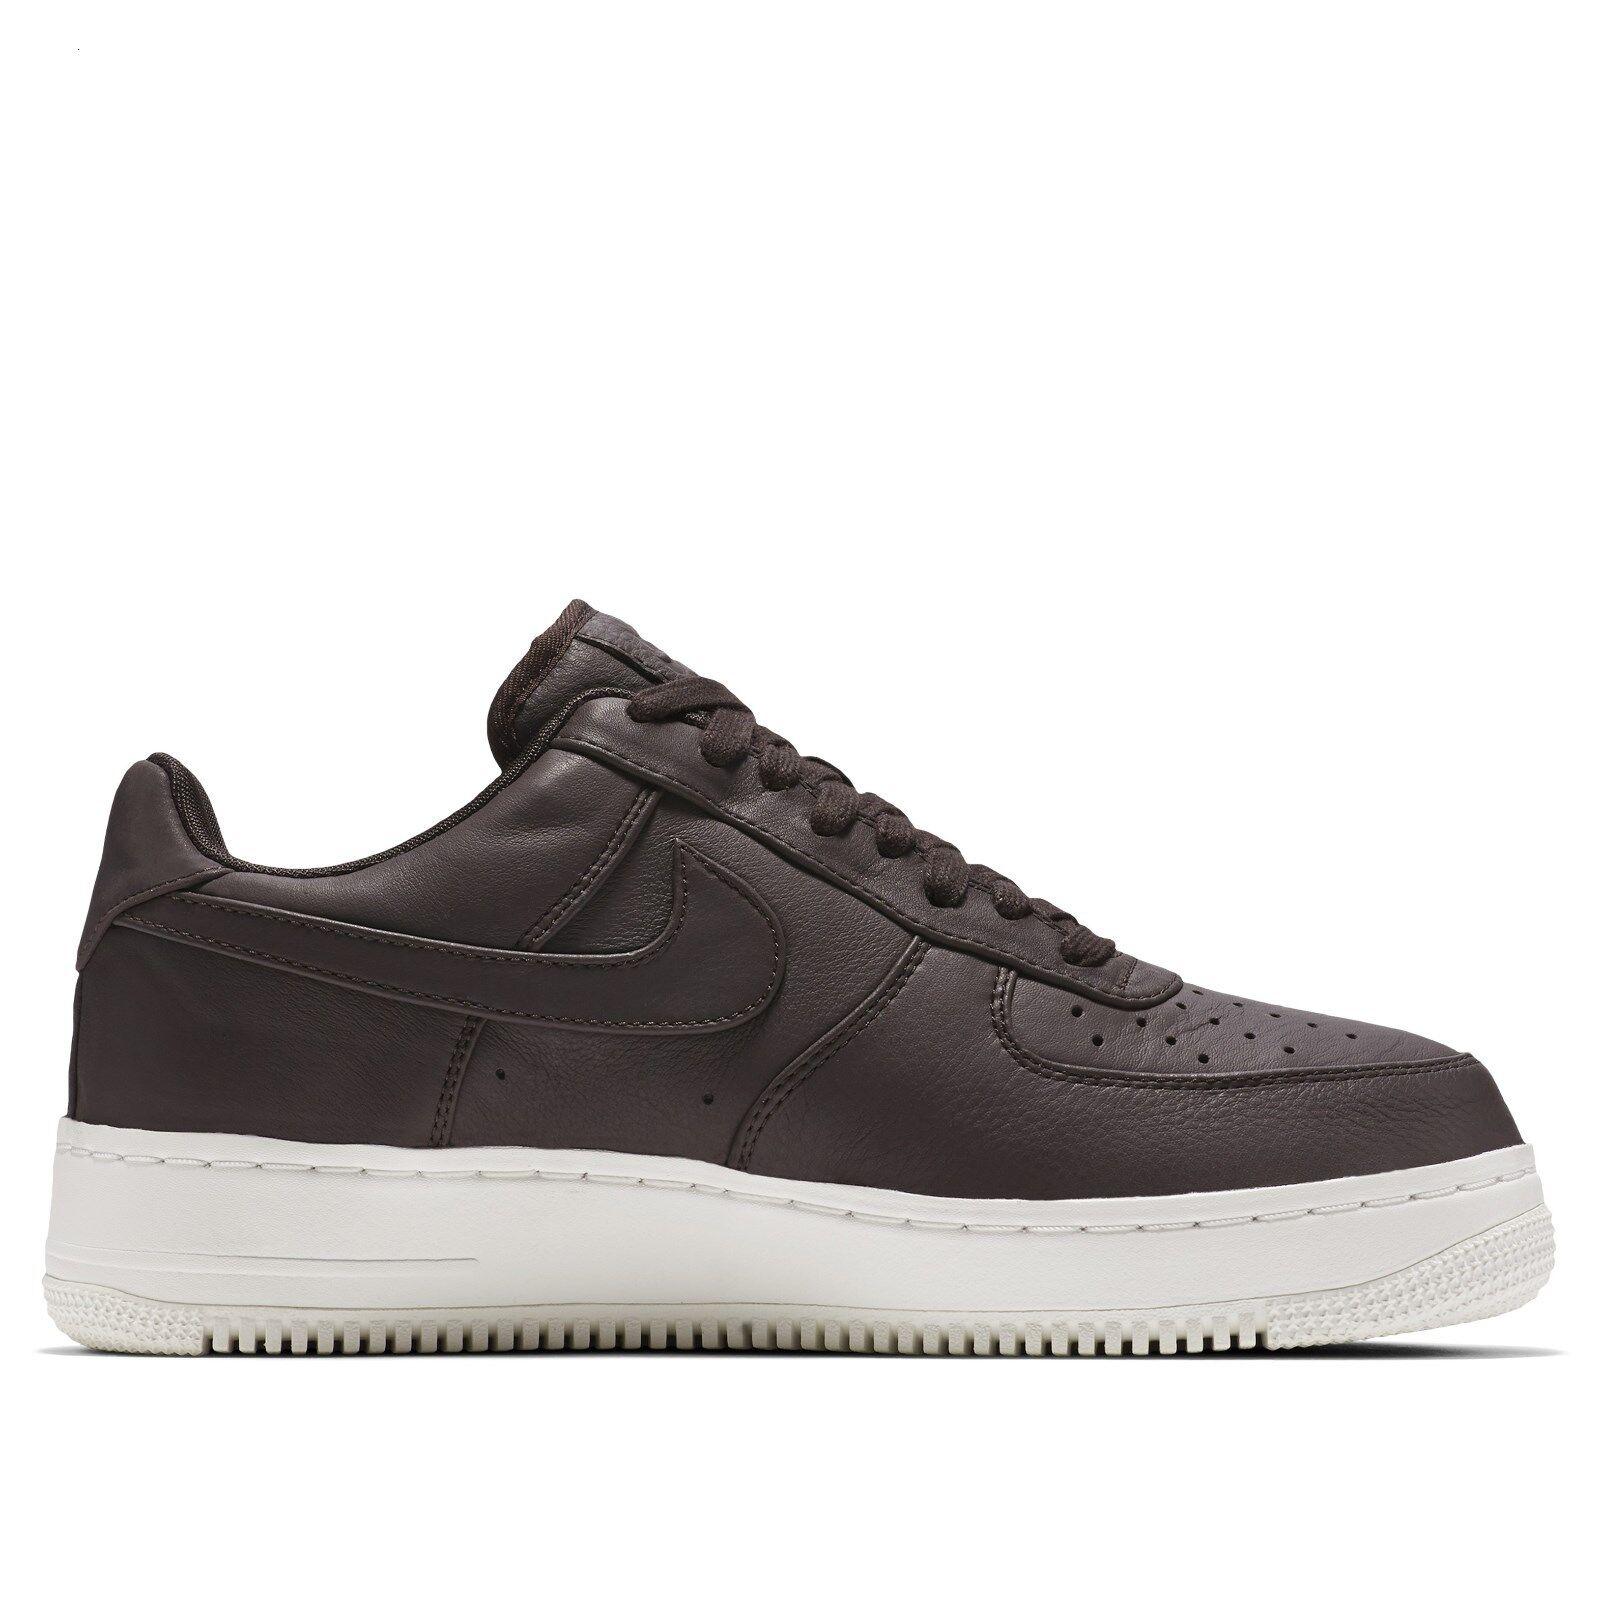 NikeLab Air Force 1 Low Black Sail White Men Shoes 905618-001 Size 7 & 10